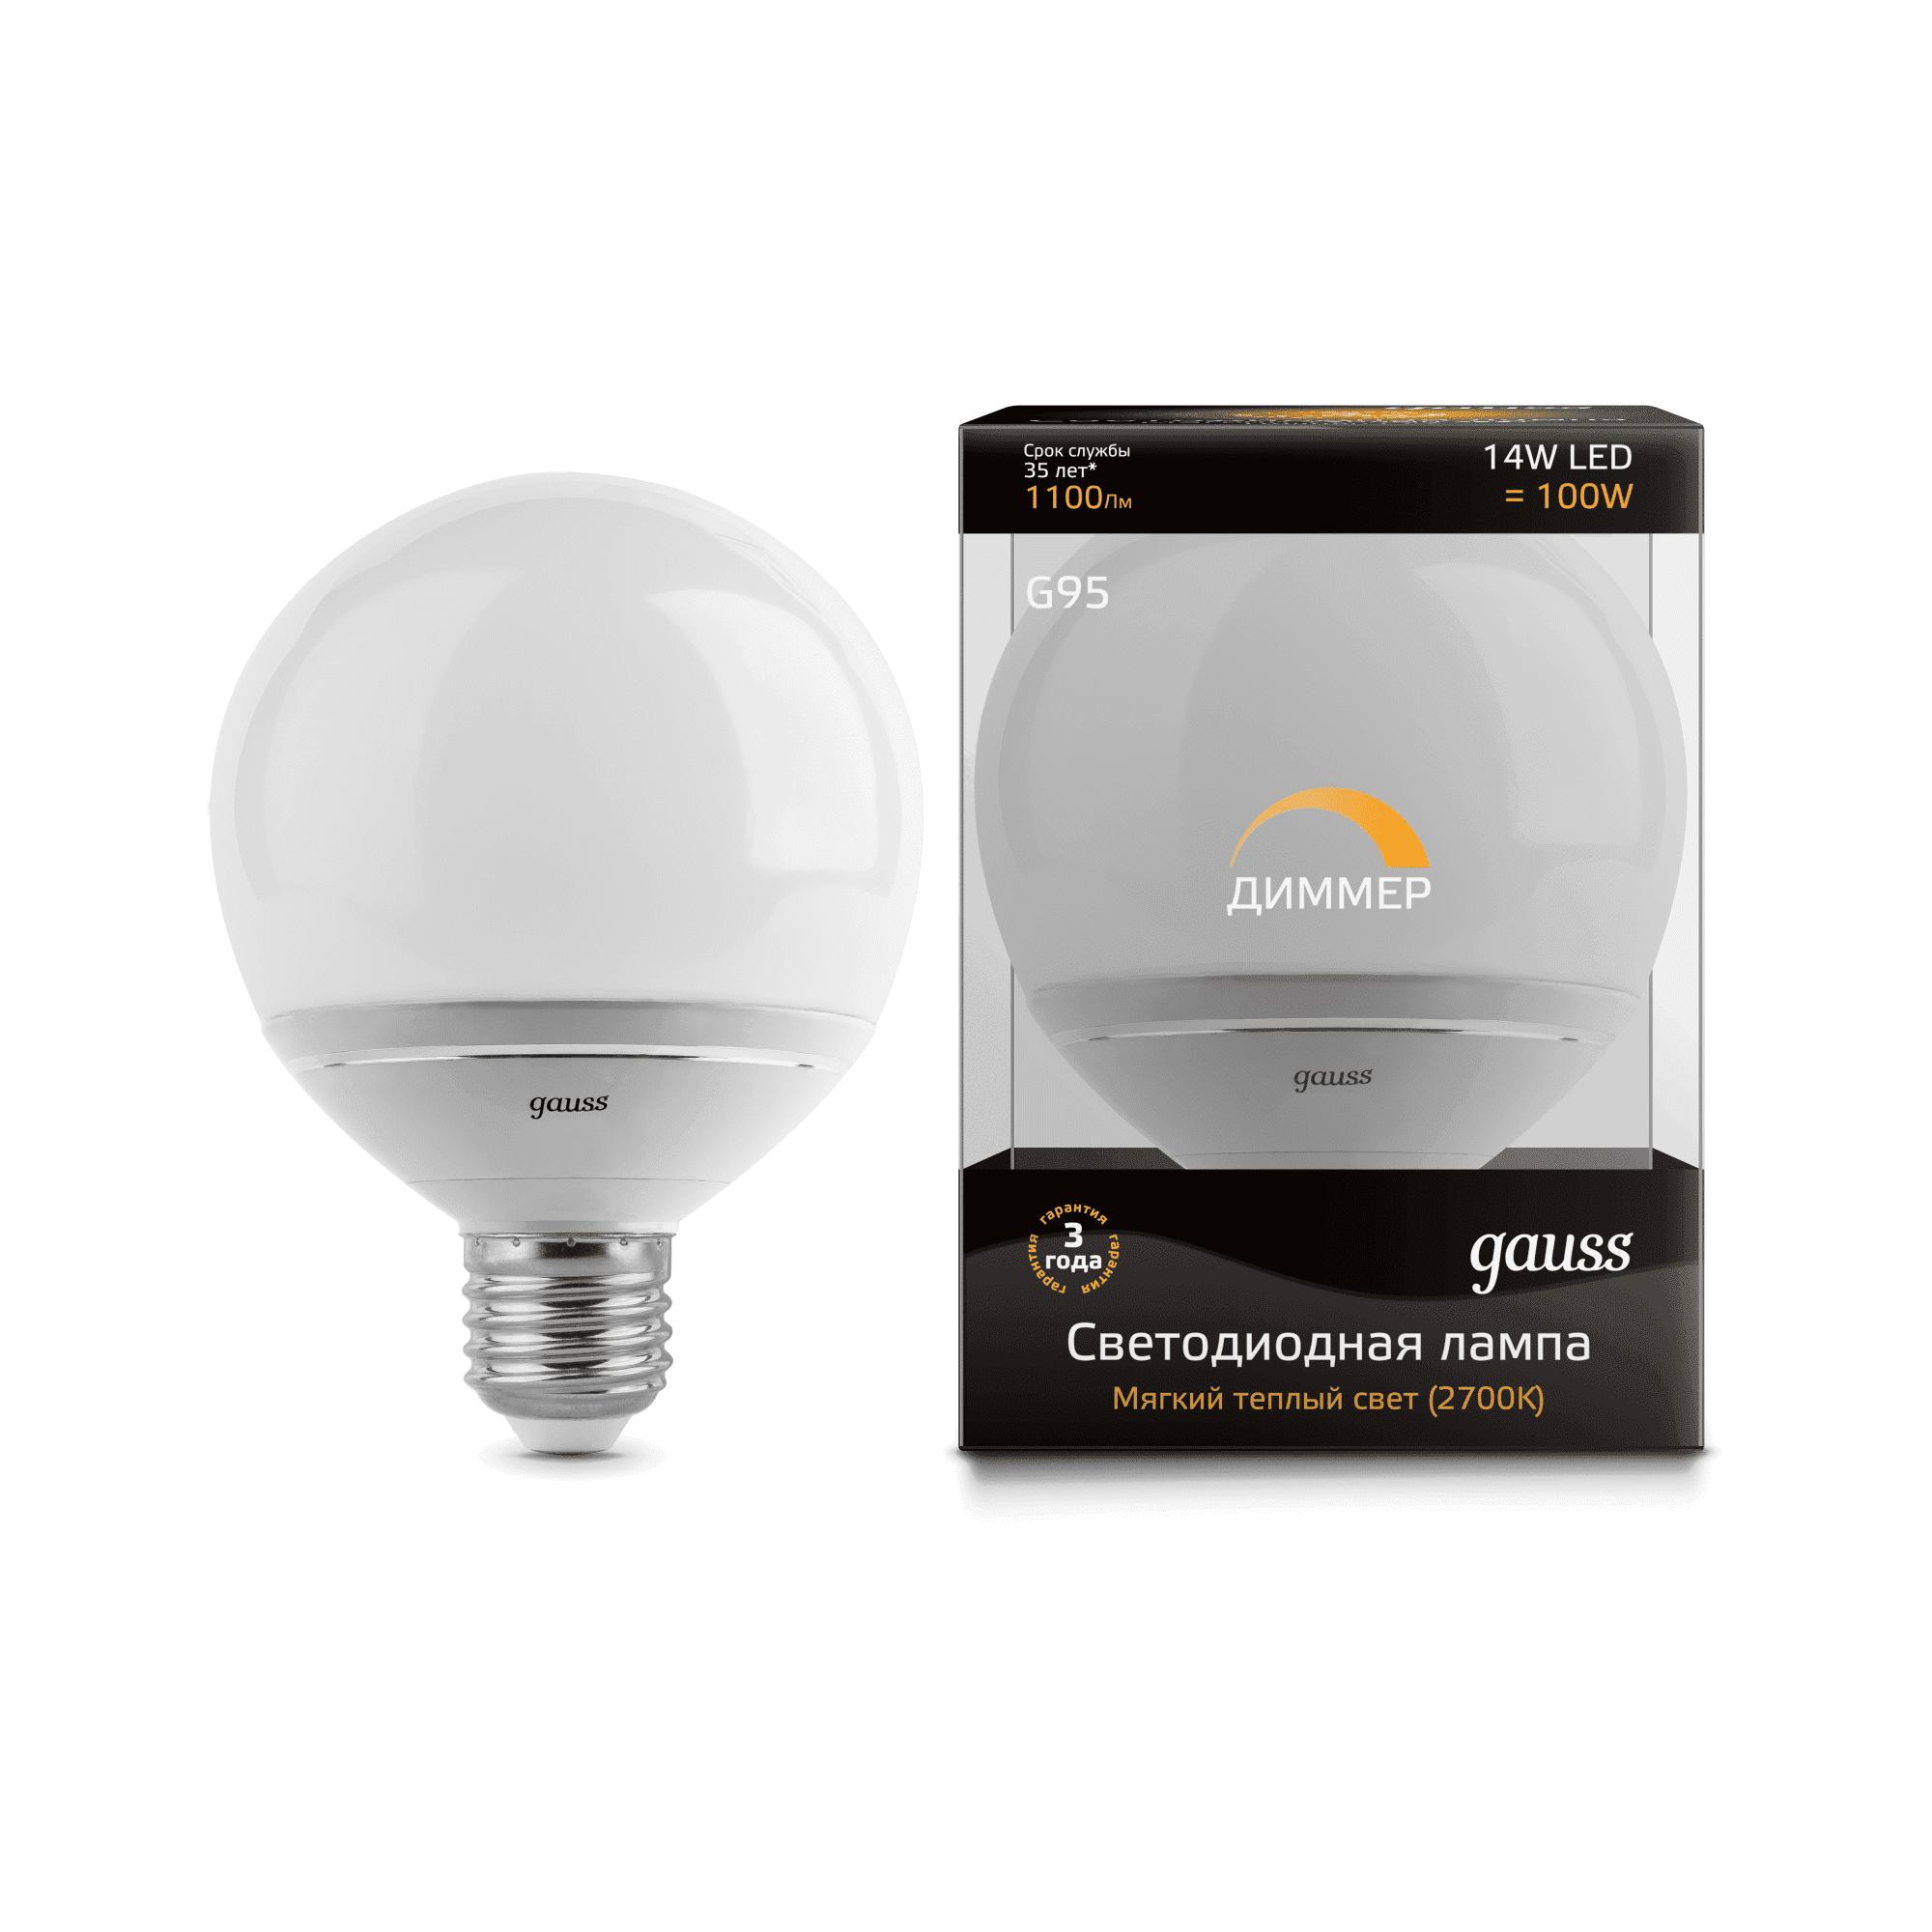 Gauss LED G95-dim 14W E27 2700K диммируемая 1/10/40 арт. EB136102114-D